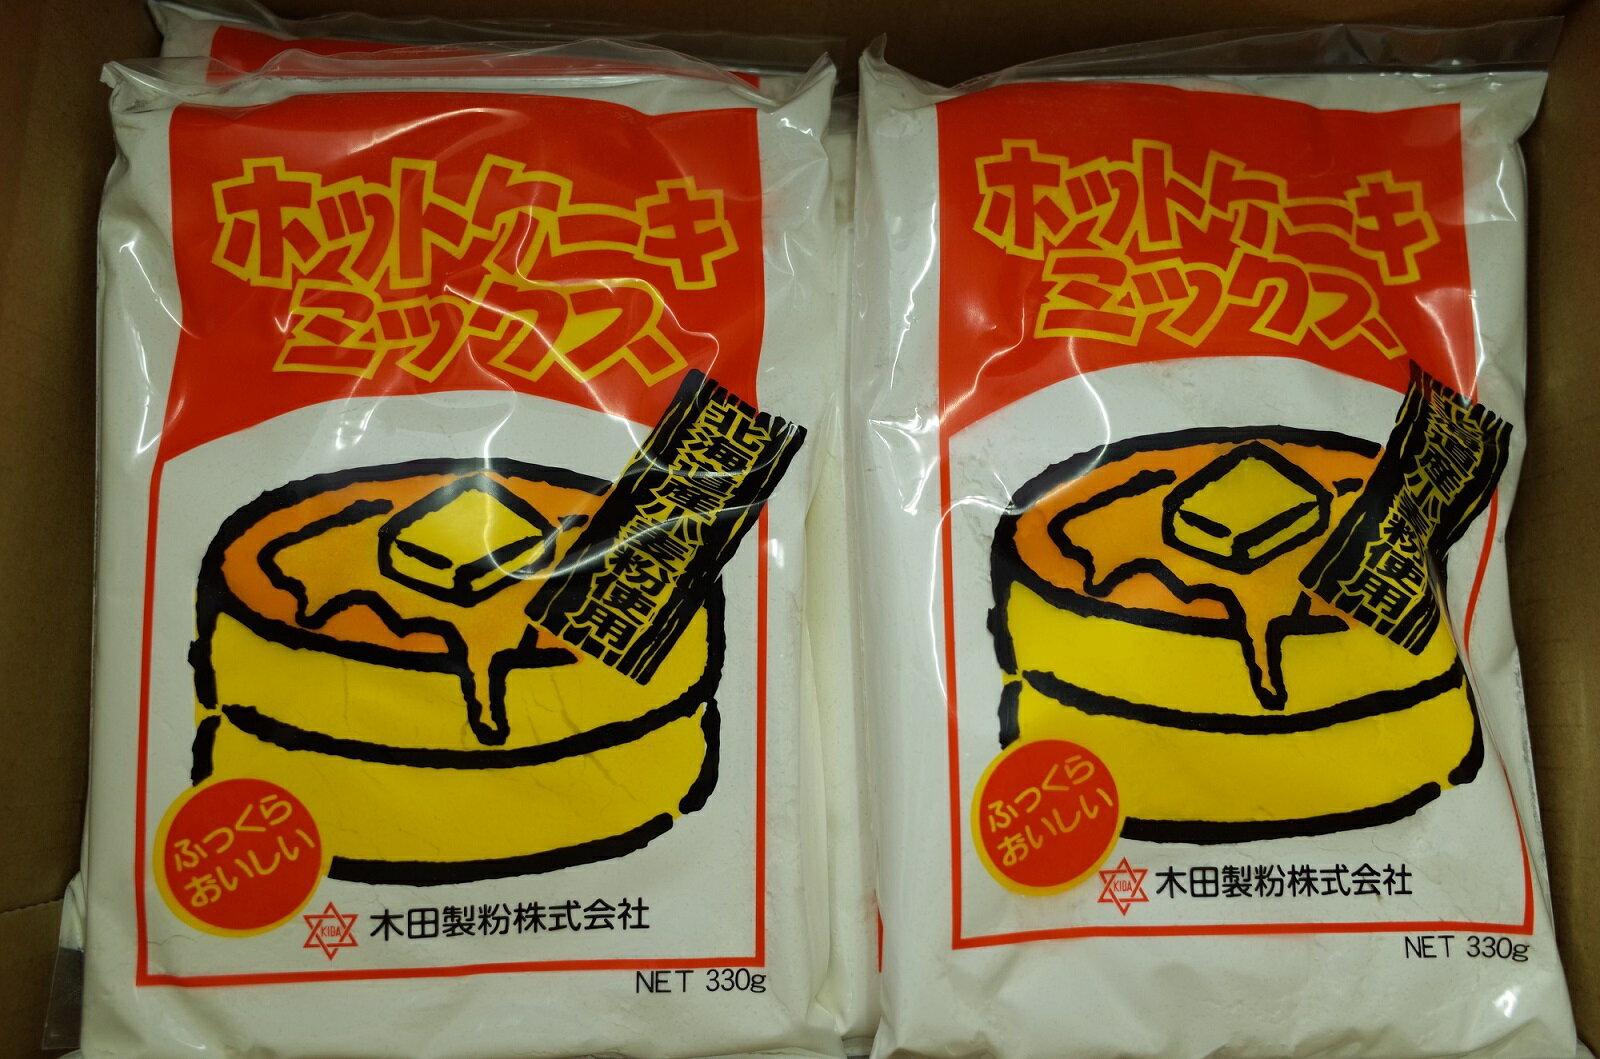 粉類, 小麦粉  330g1696